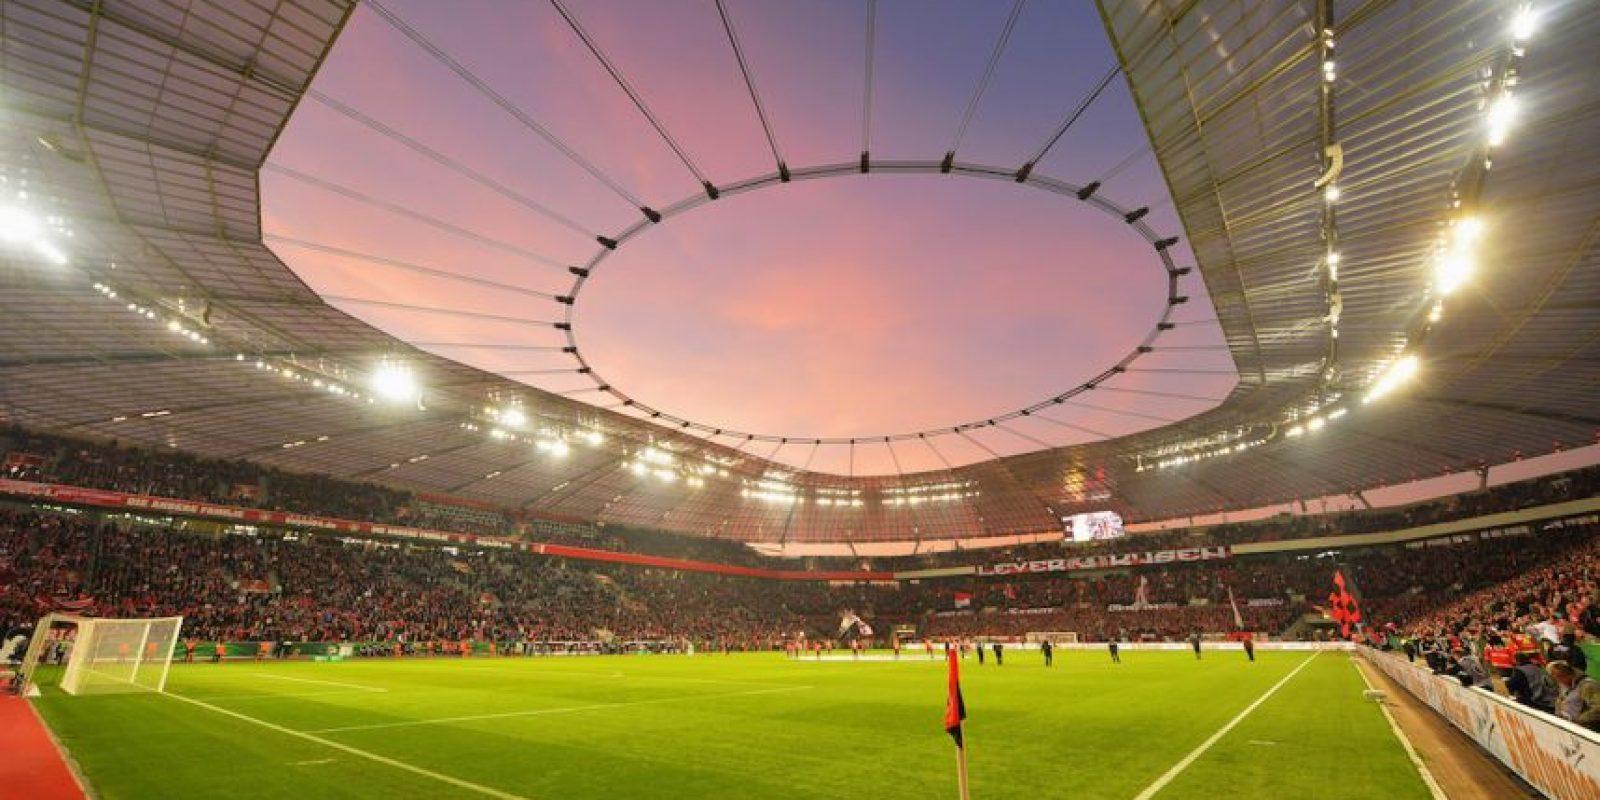 Bayern Leverkusen vs. Bayern Munich Foto:Getty Images